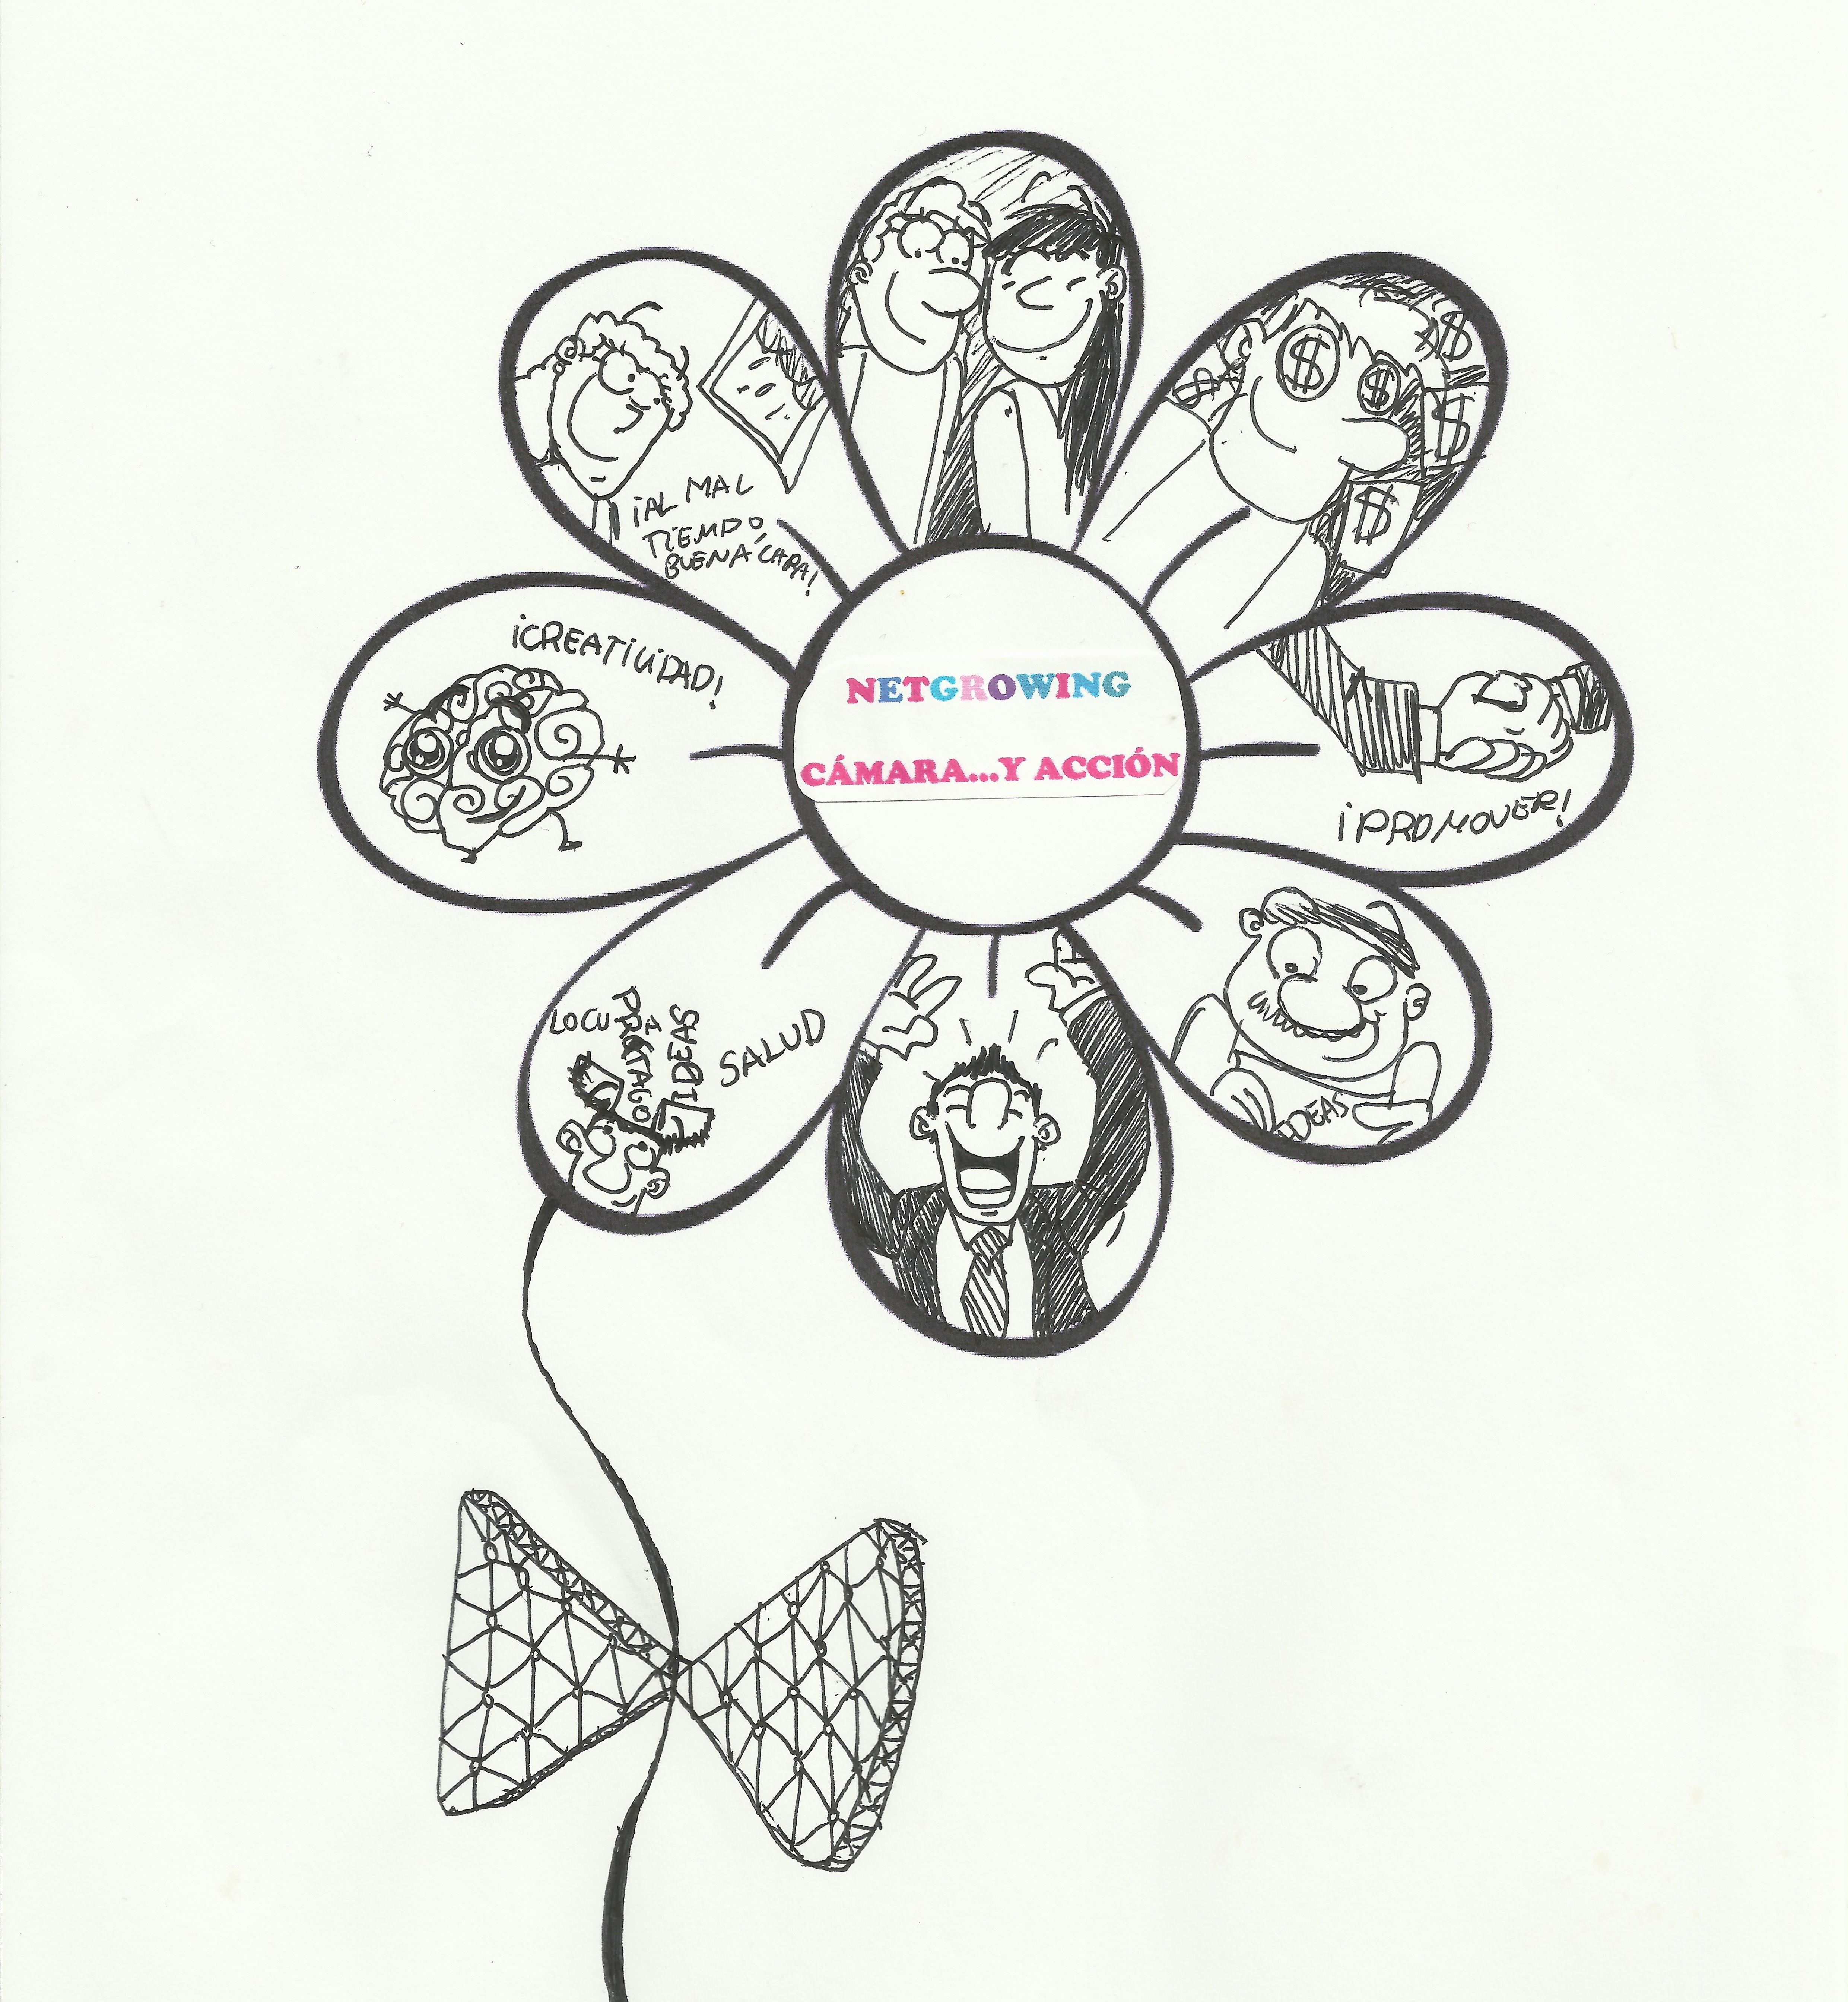 logo netgrowing flor copyright Éire Sánchez